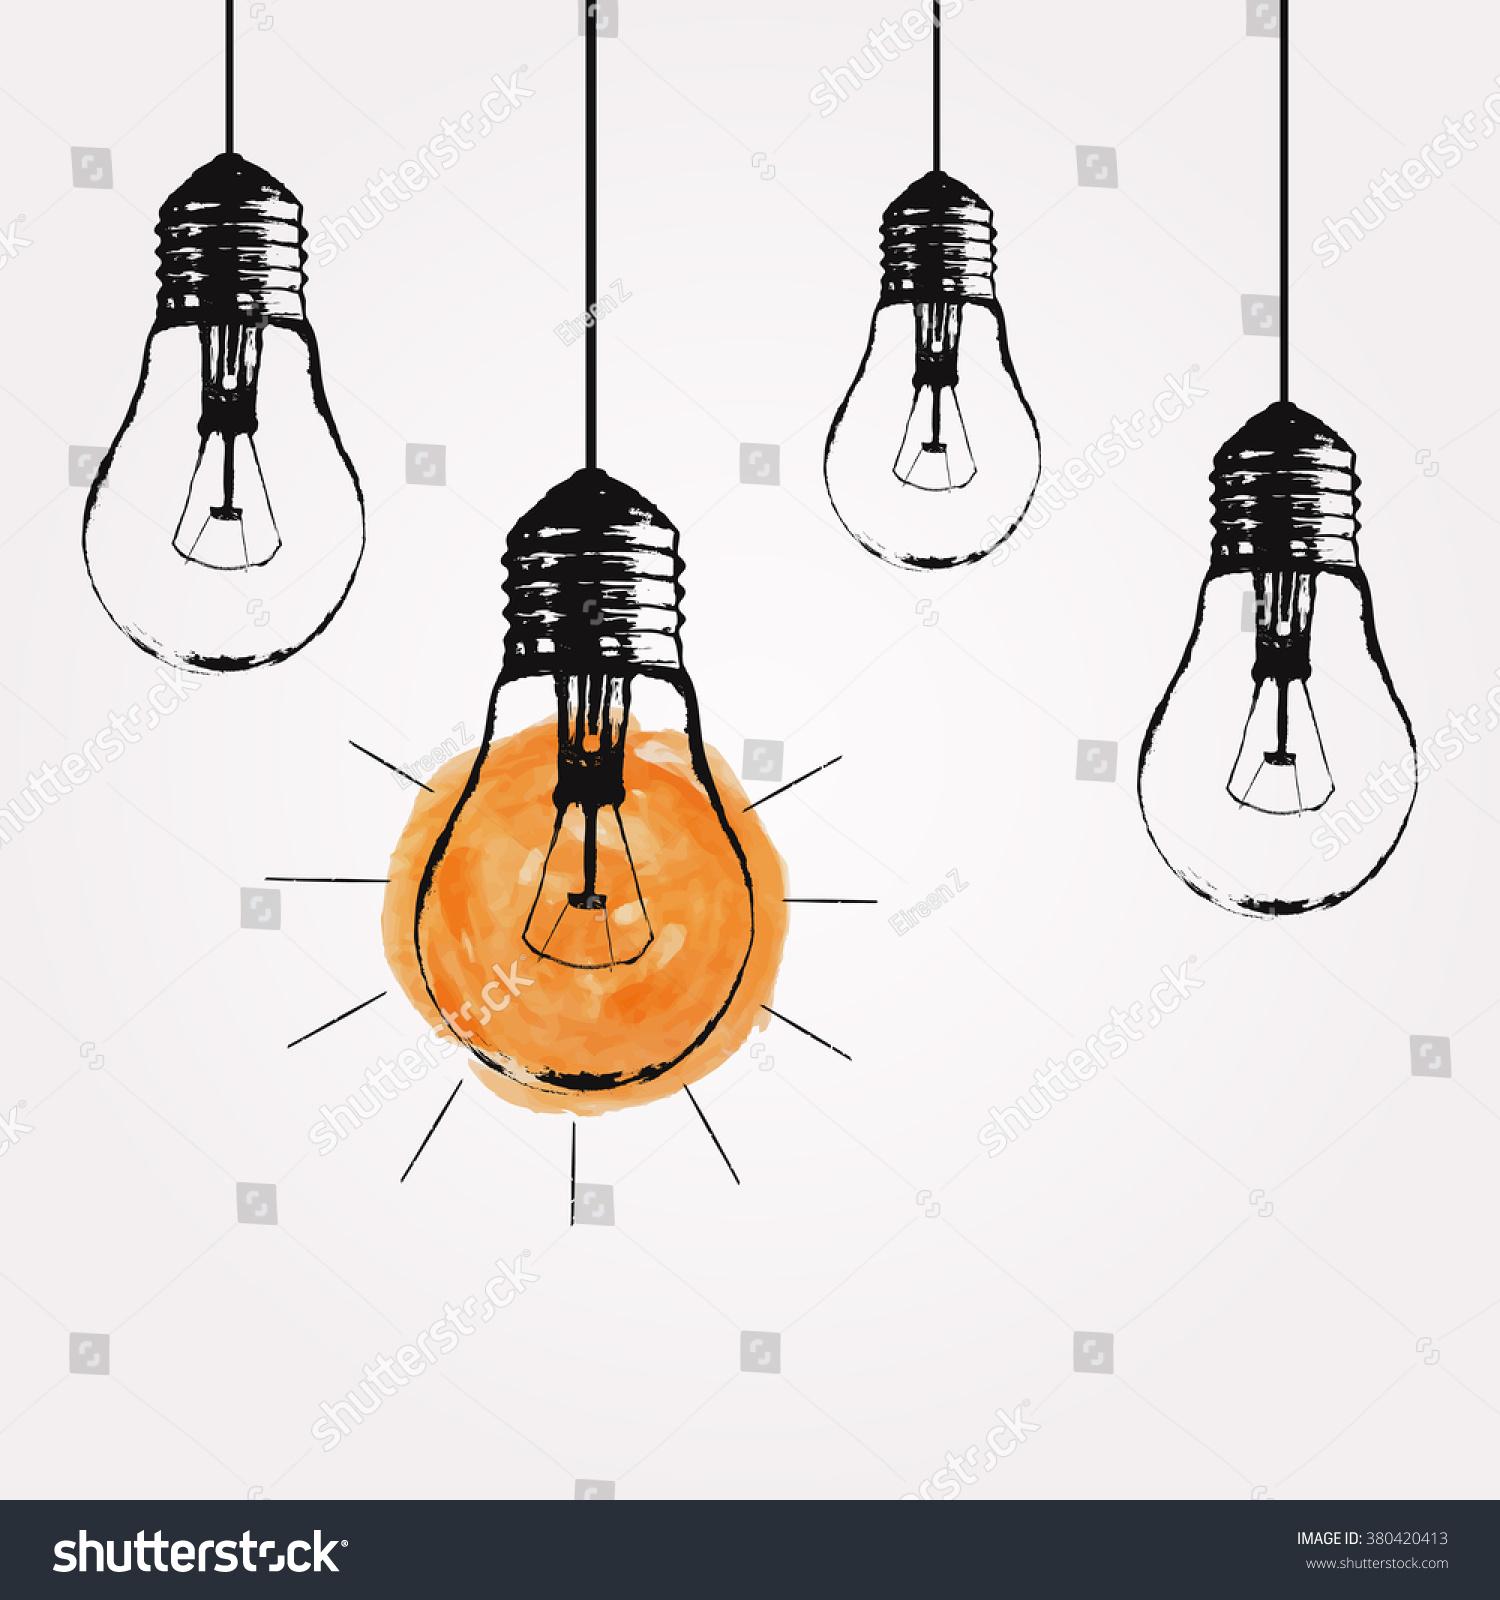 Vector Grunge Illustration Hanging Light Bulbs Stock